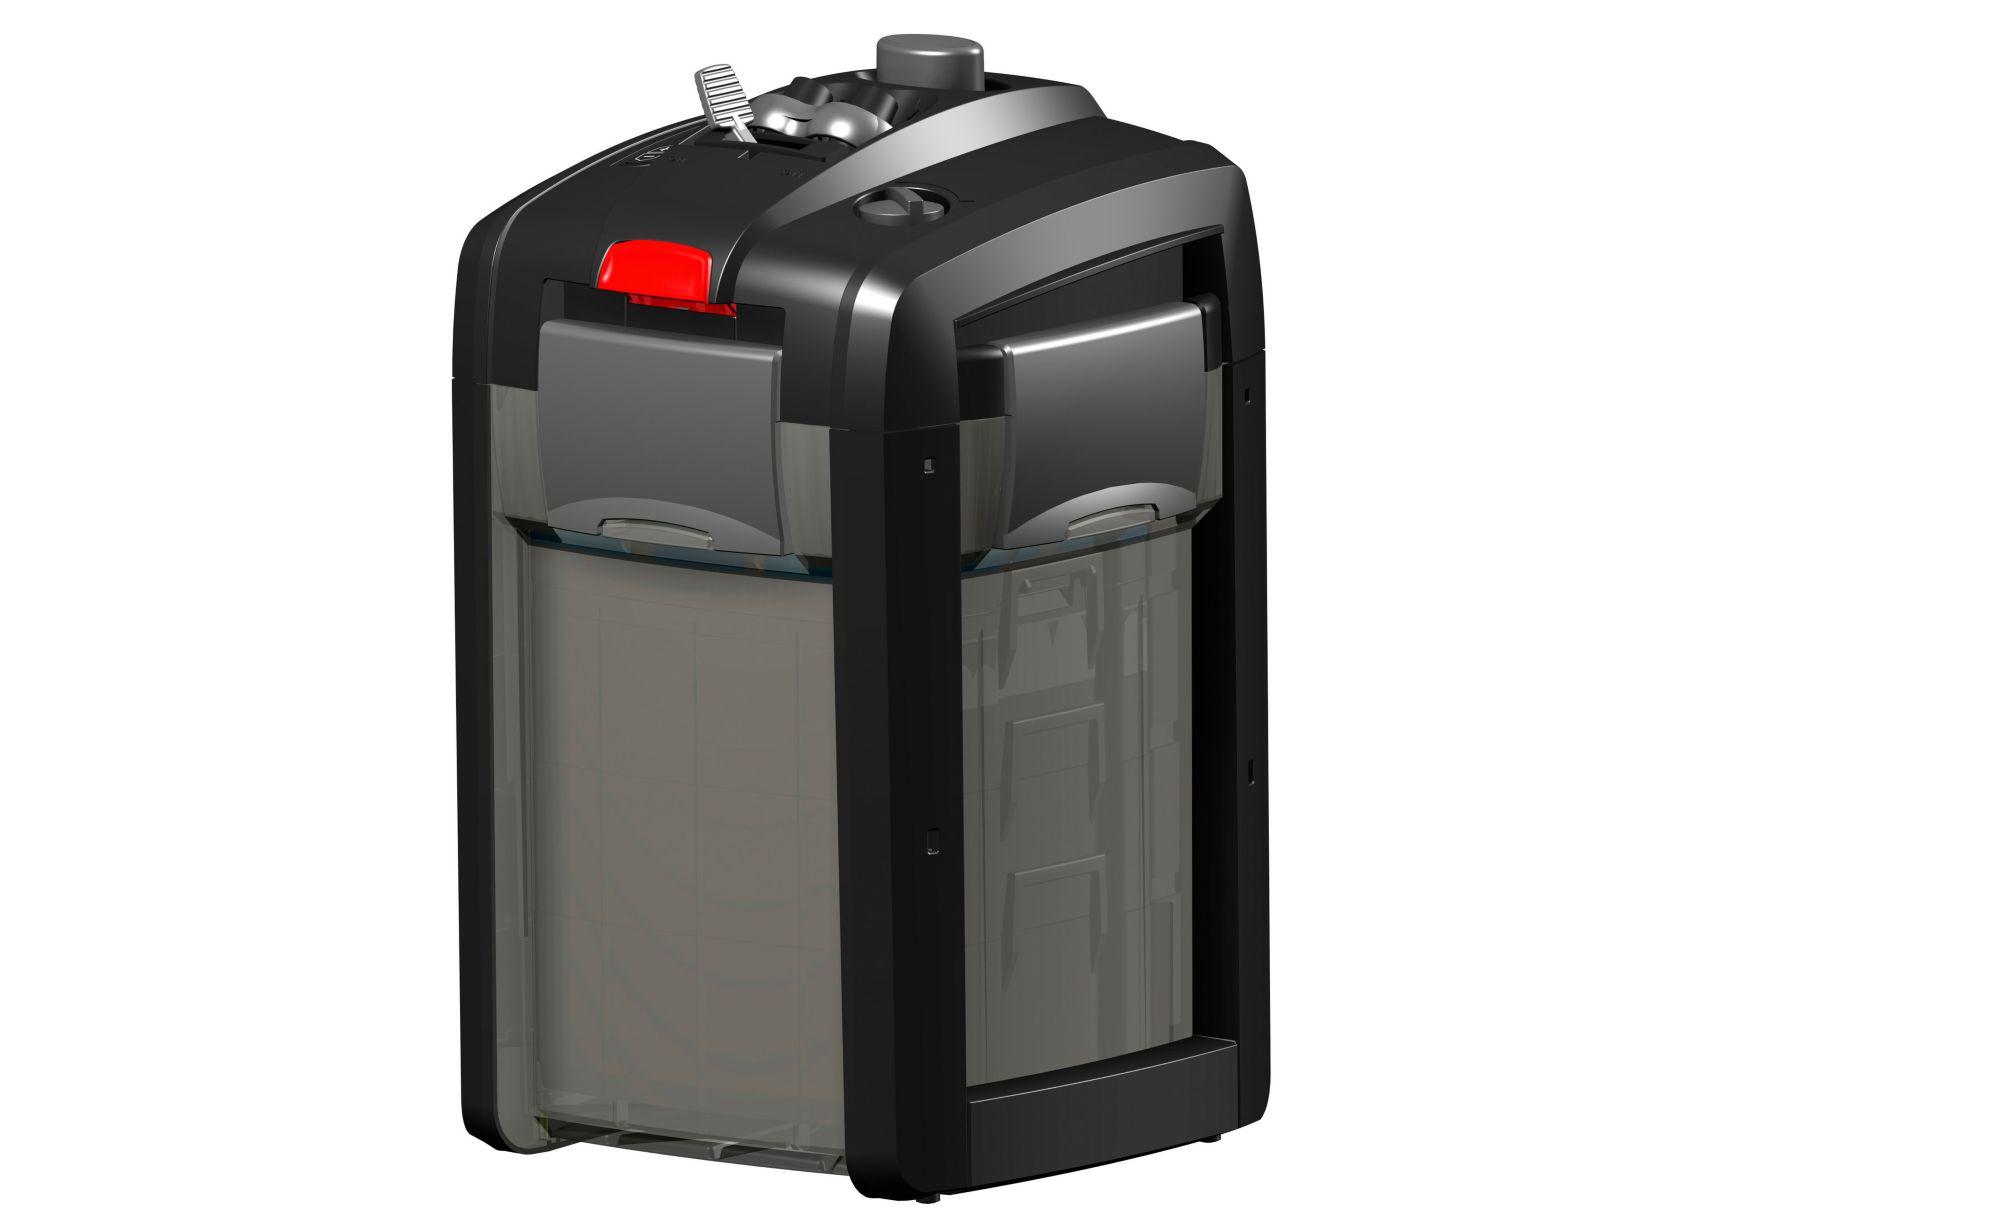 EHEIM Aquarienfilter »professionel 4e 350 Range Extender«